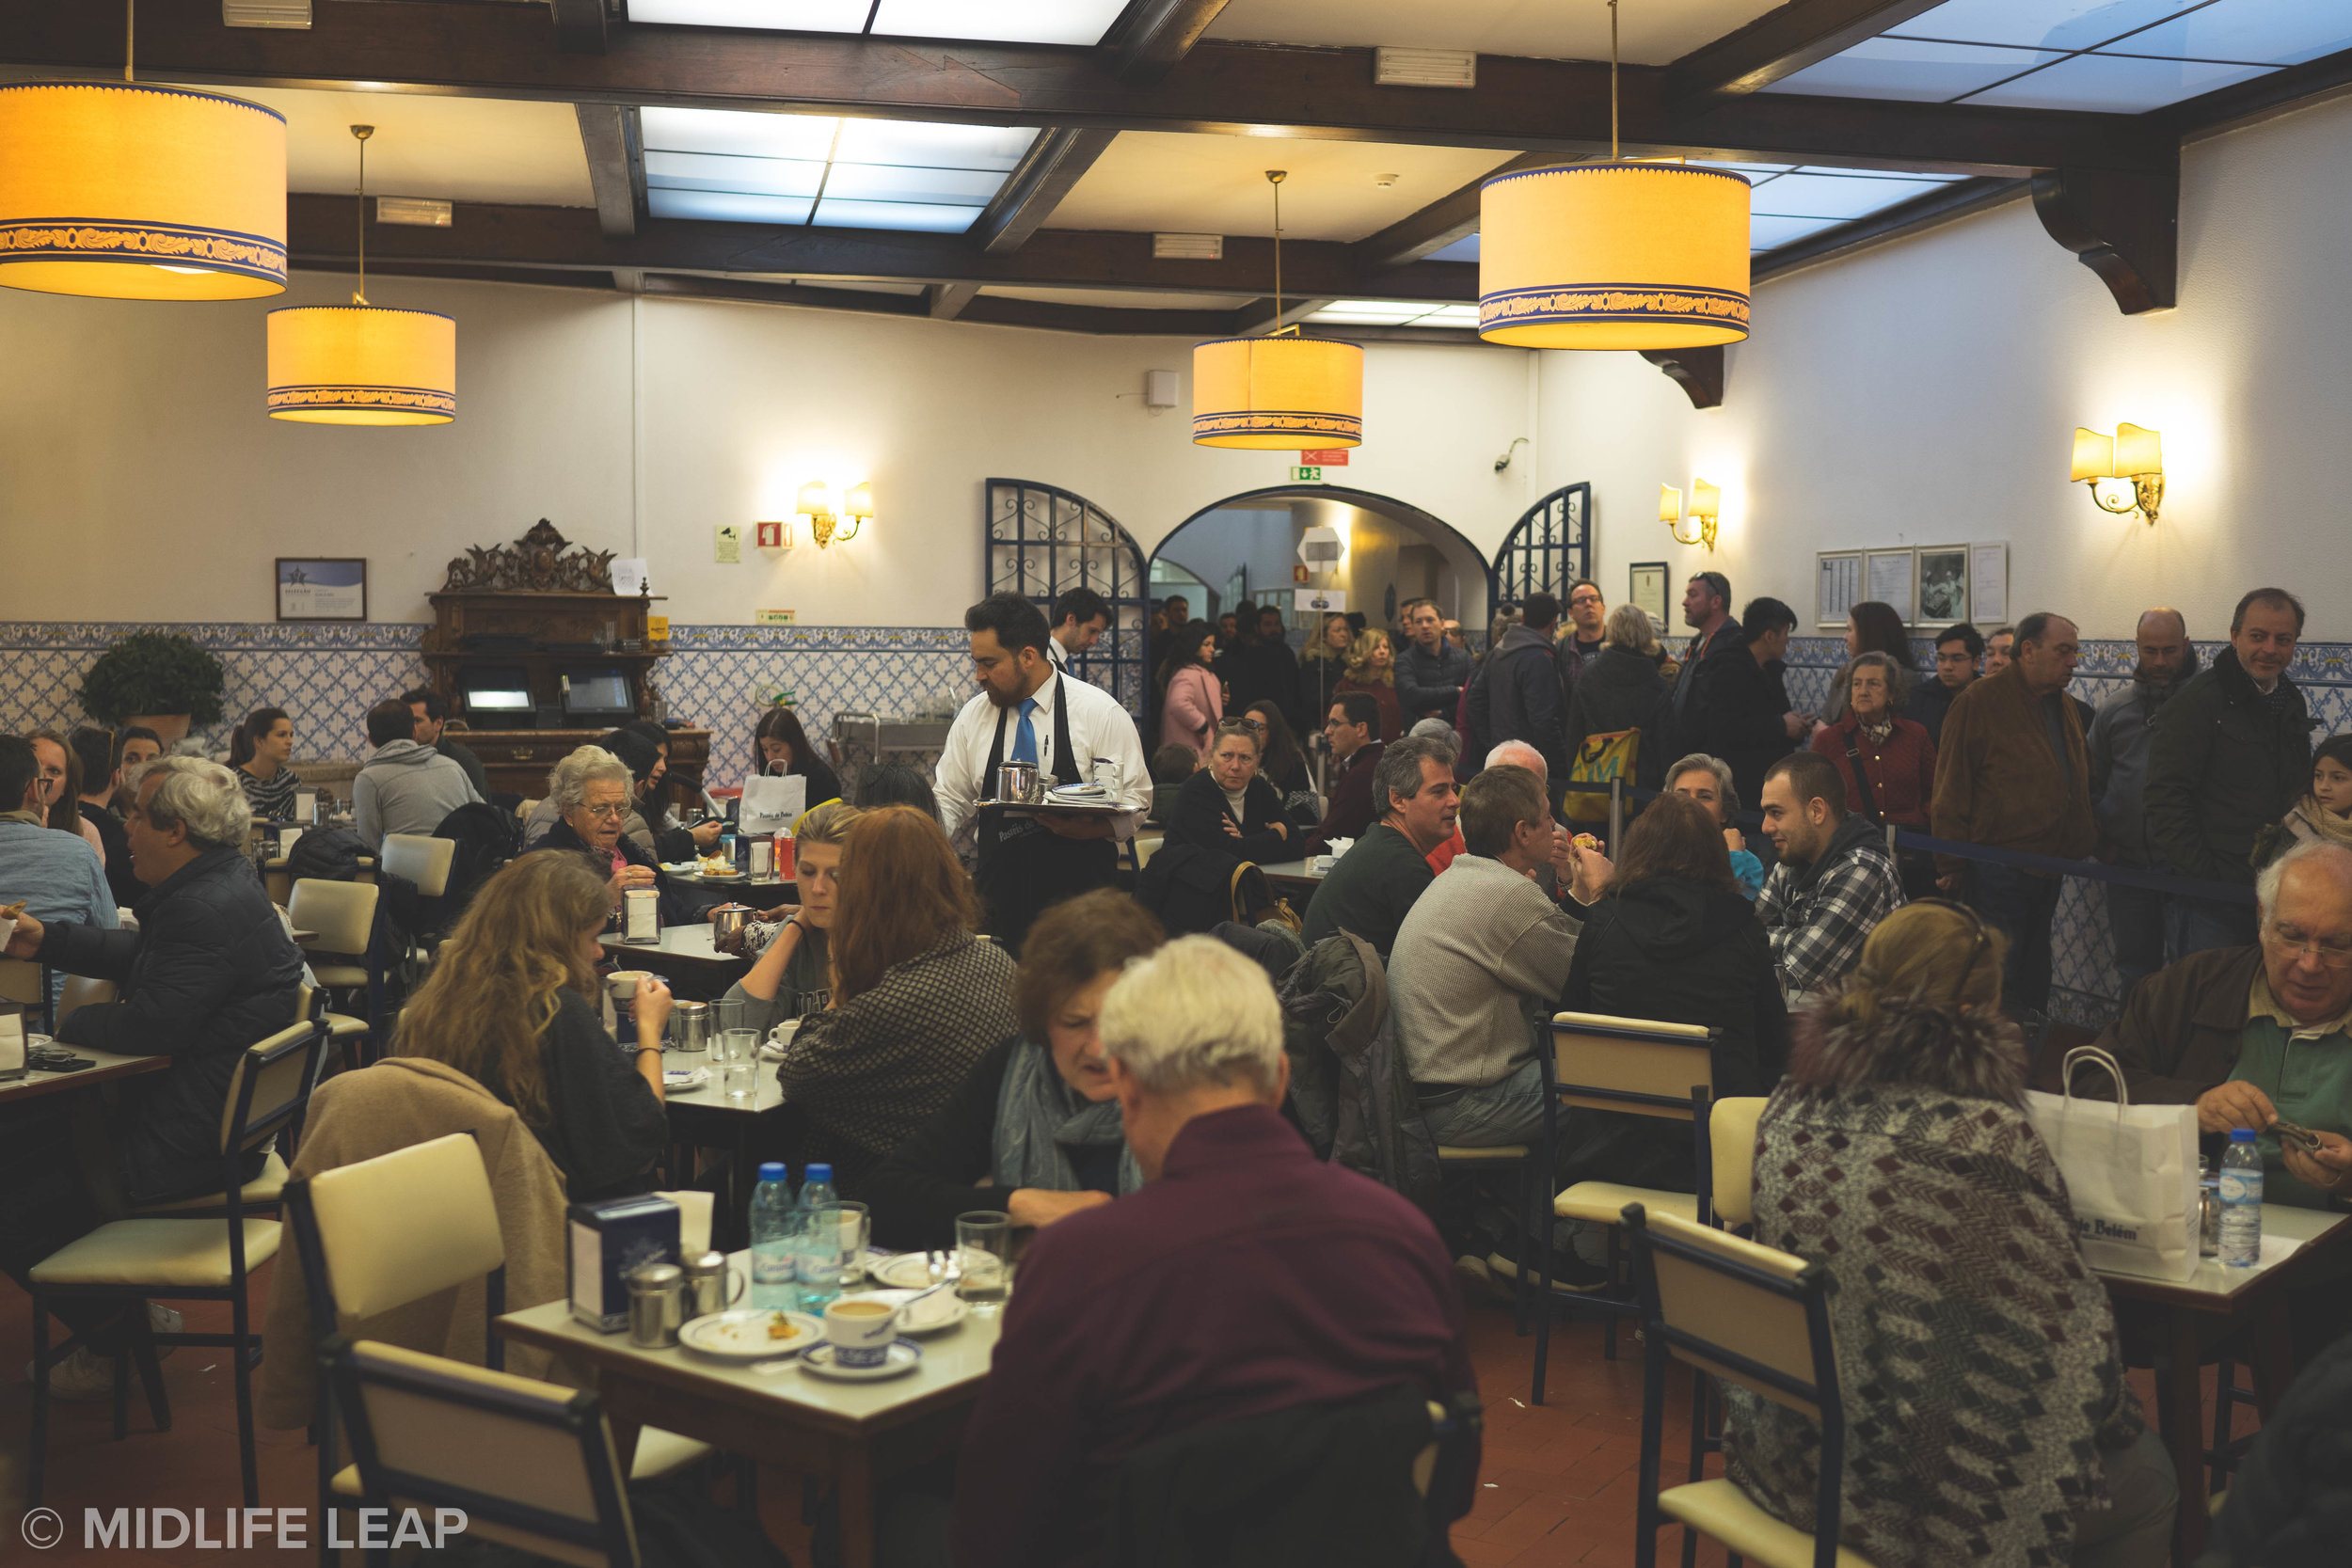 Antiga-Confeitaria-de-Belém-best-pasteis-de-nata-lisbon